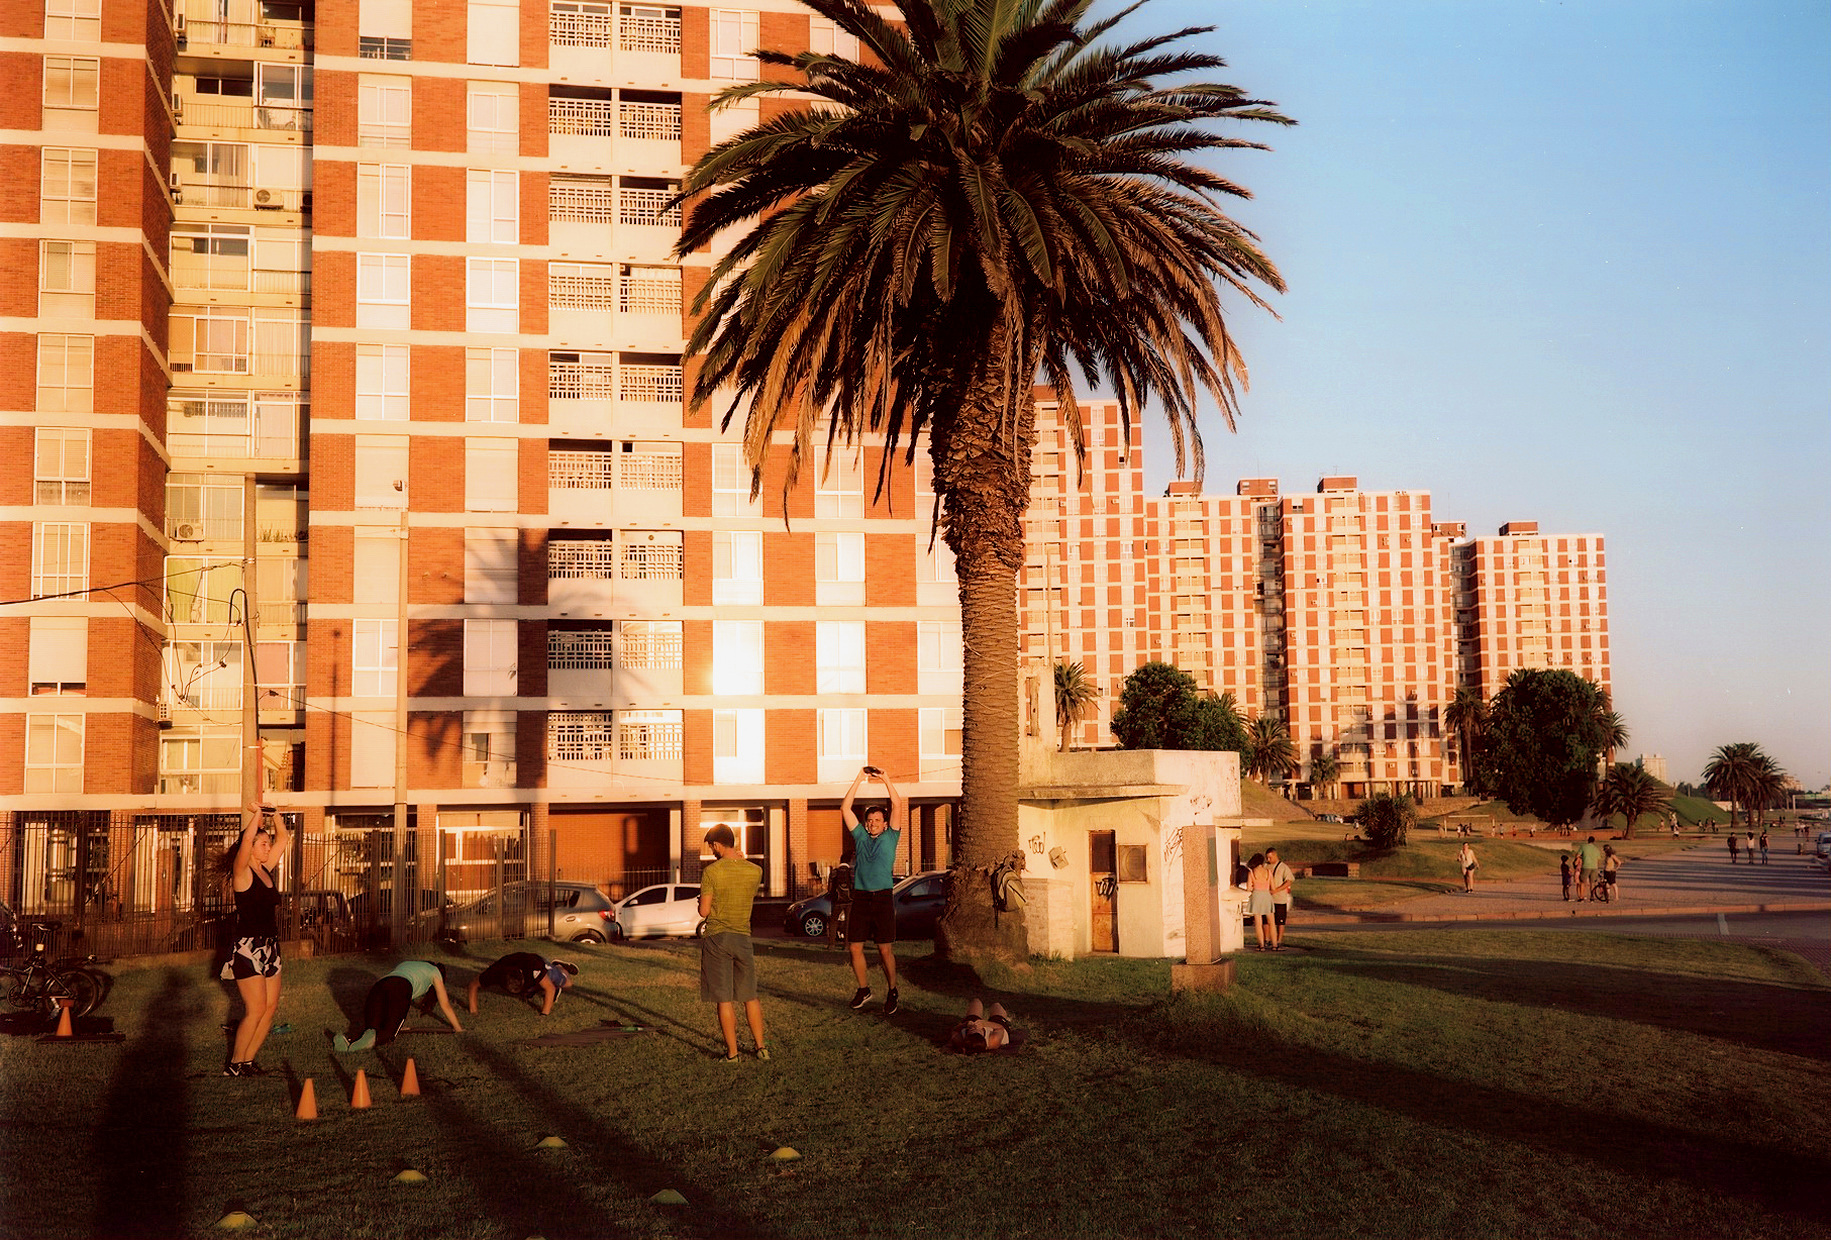 At the malacon of Montevideo, Uruguay